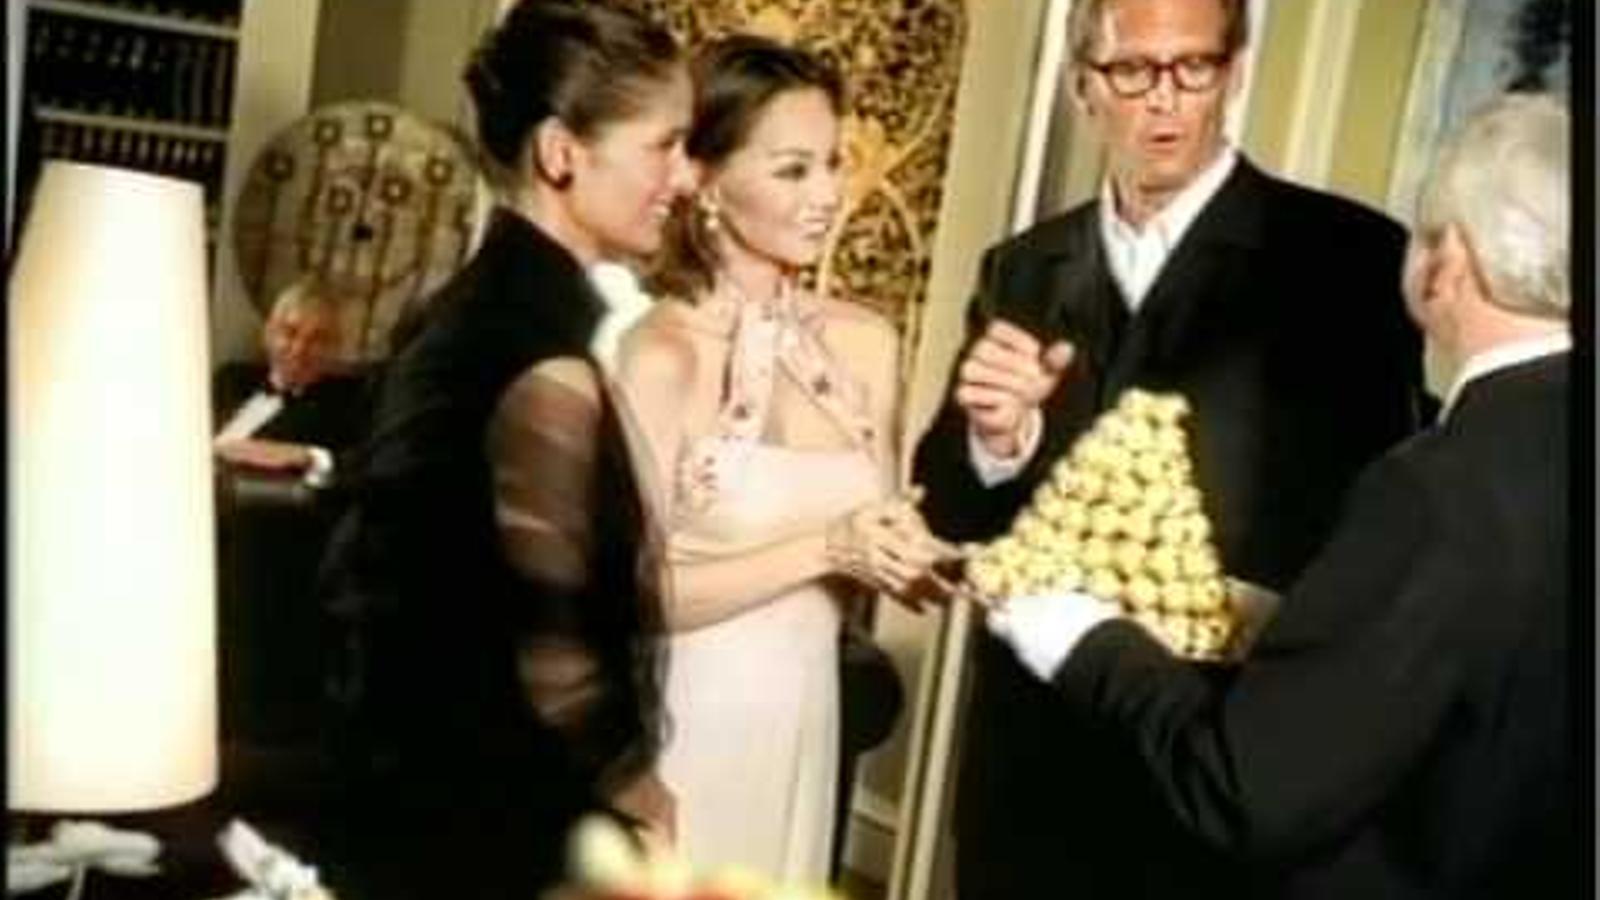 Anunci Ferrero Rocher